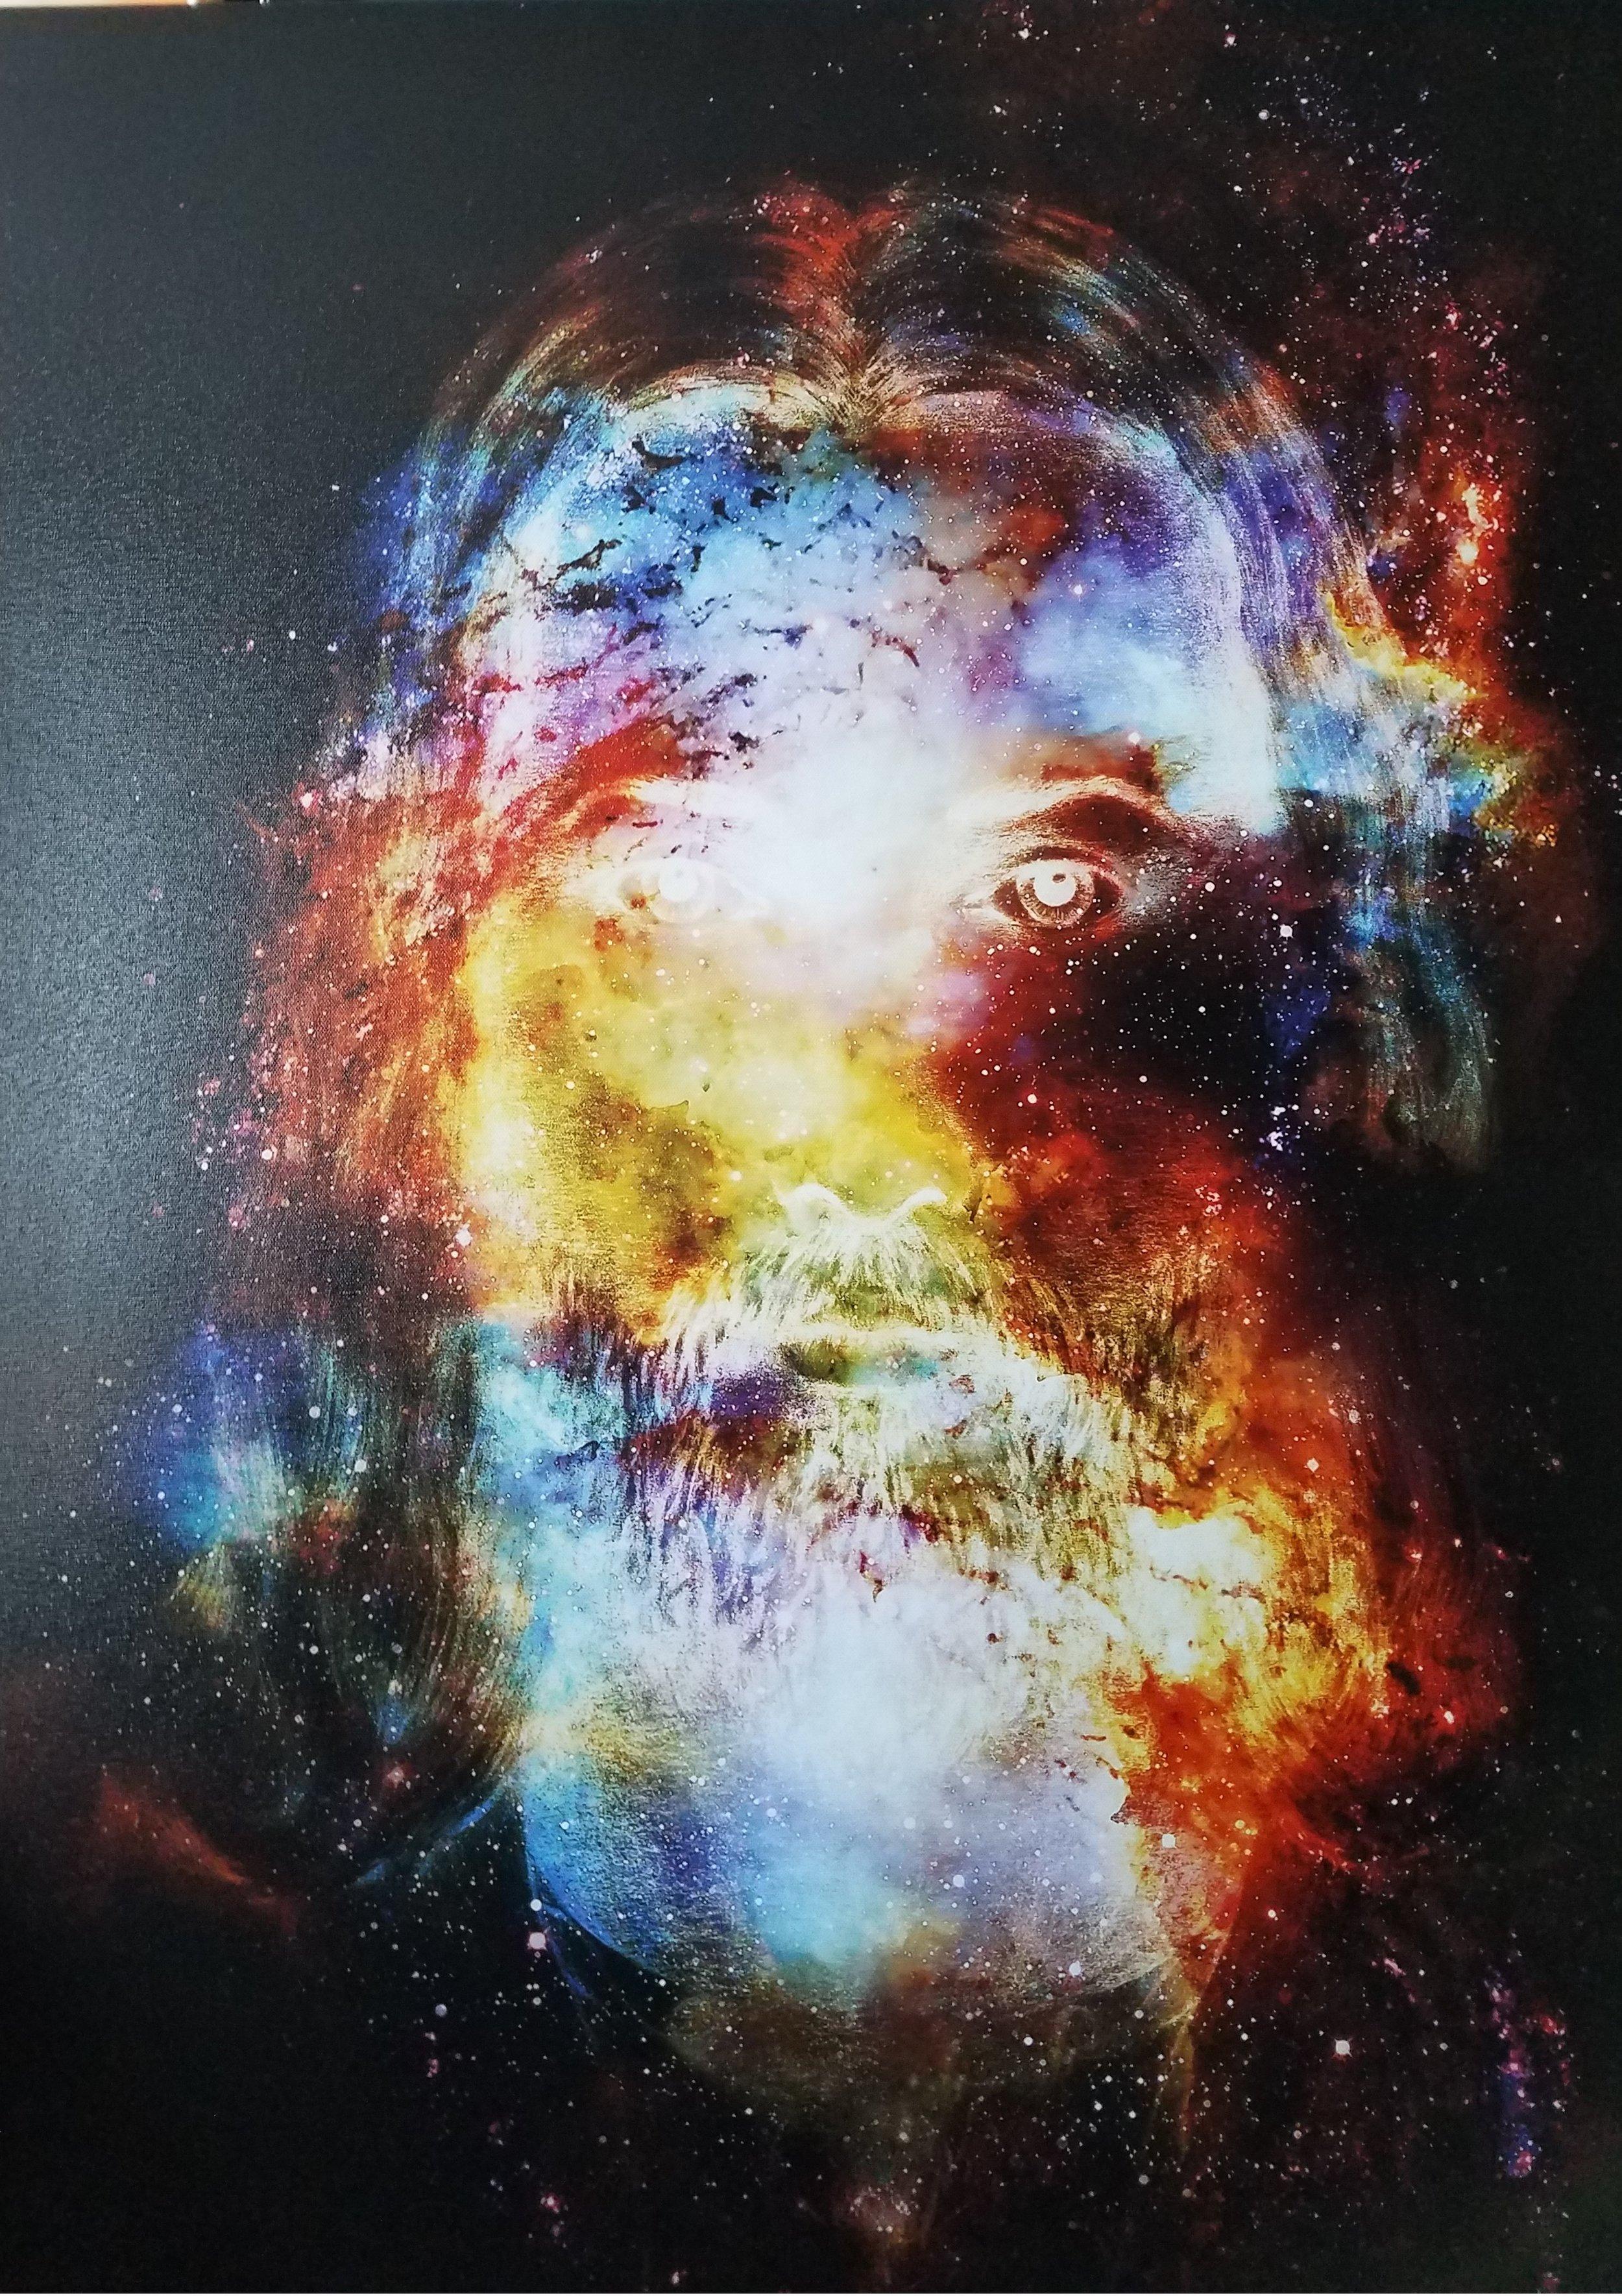 Cosmic Christ by Jozef Klopacka